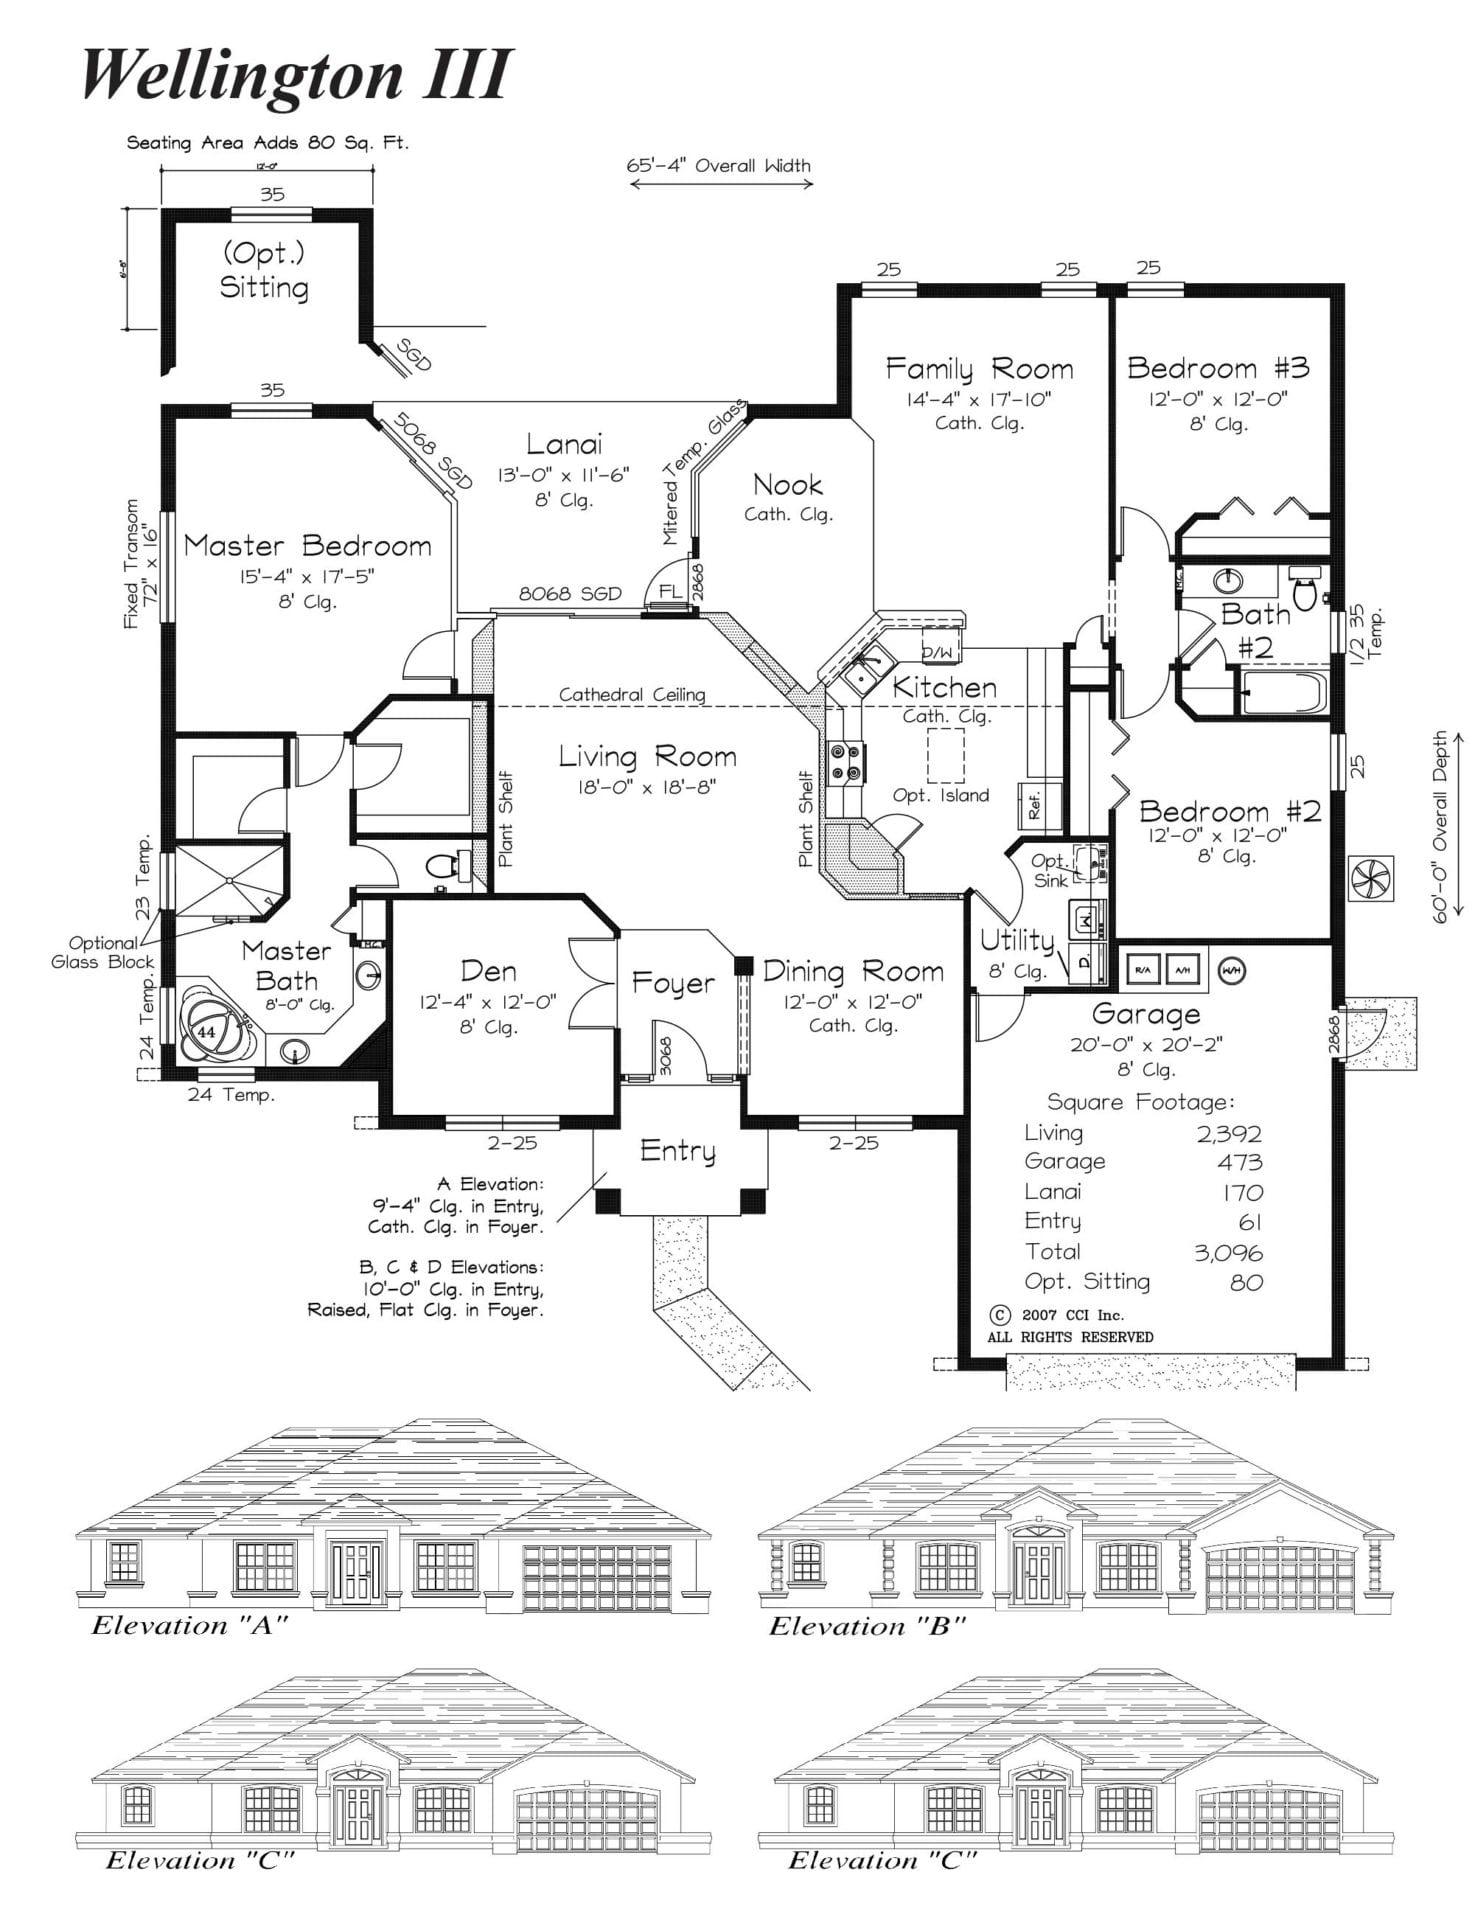 Wellington III Floor Plan - Curington Homes - Ocala Florida Contractor